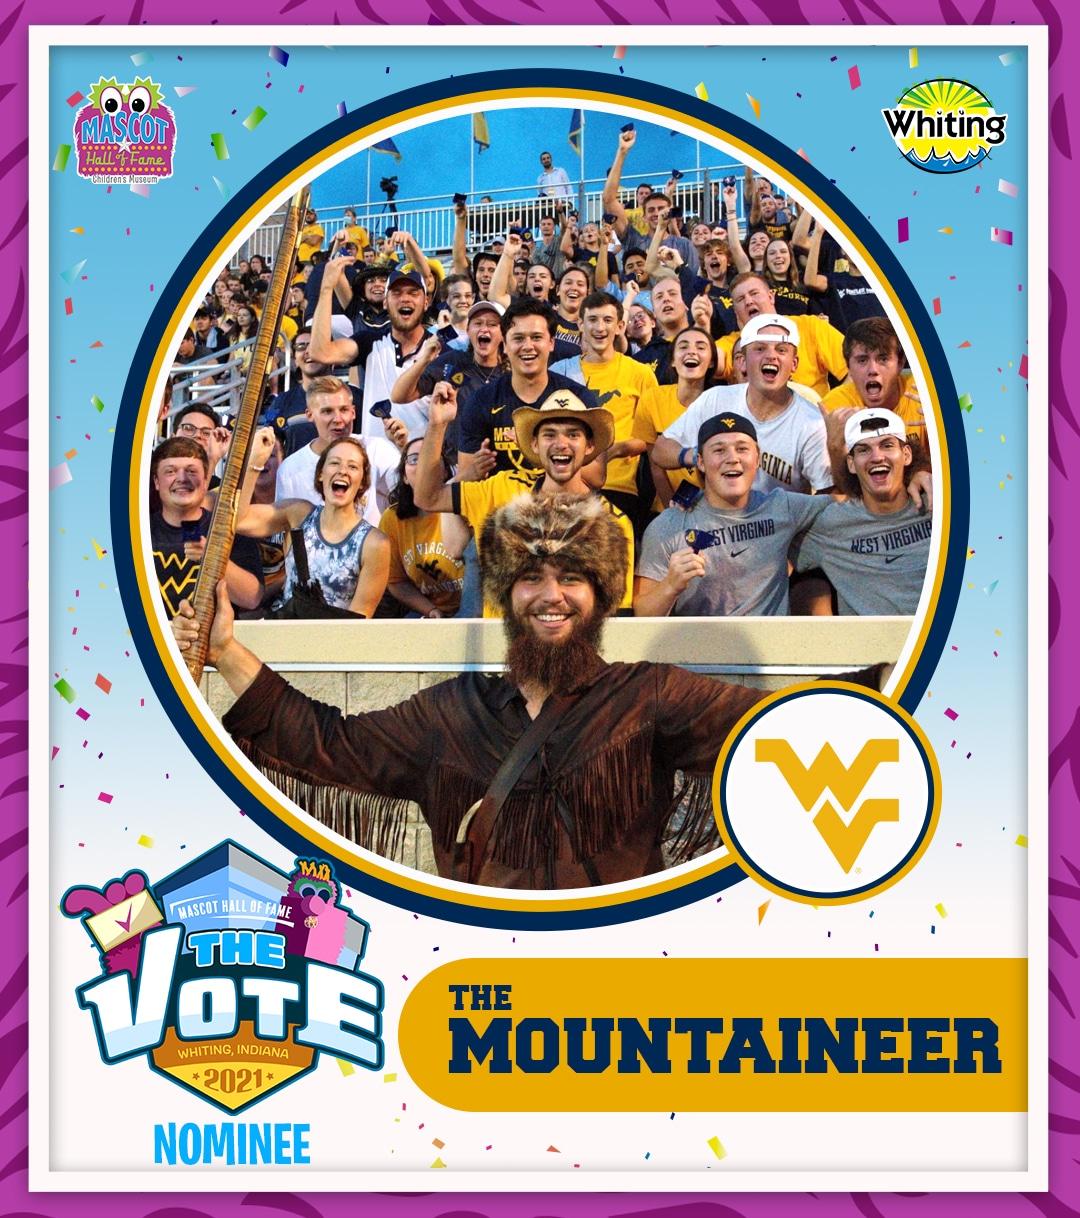 The Mountaineer photo